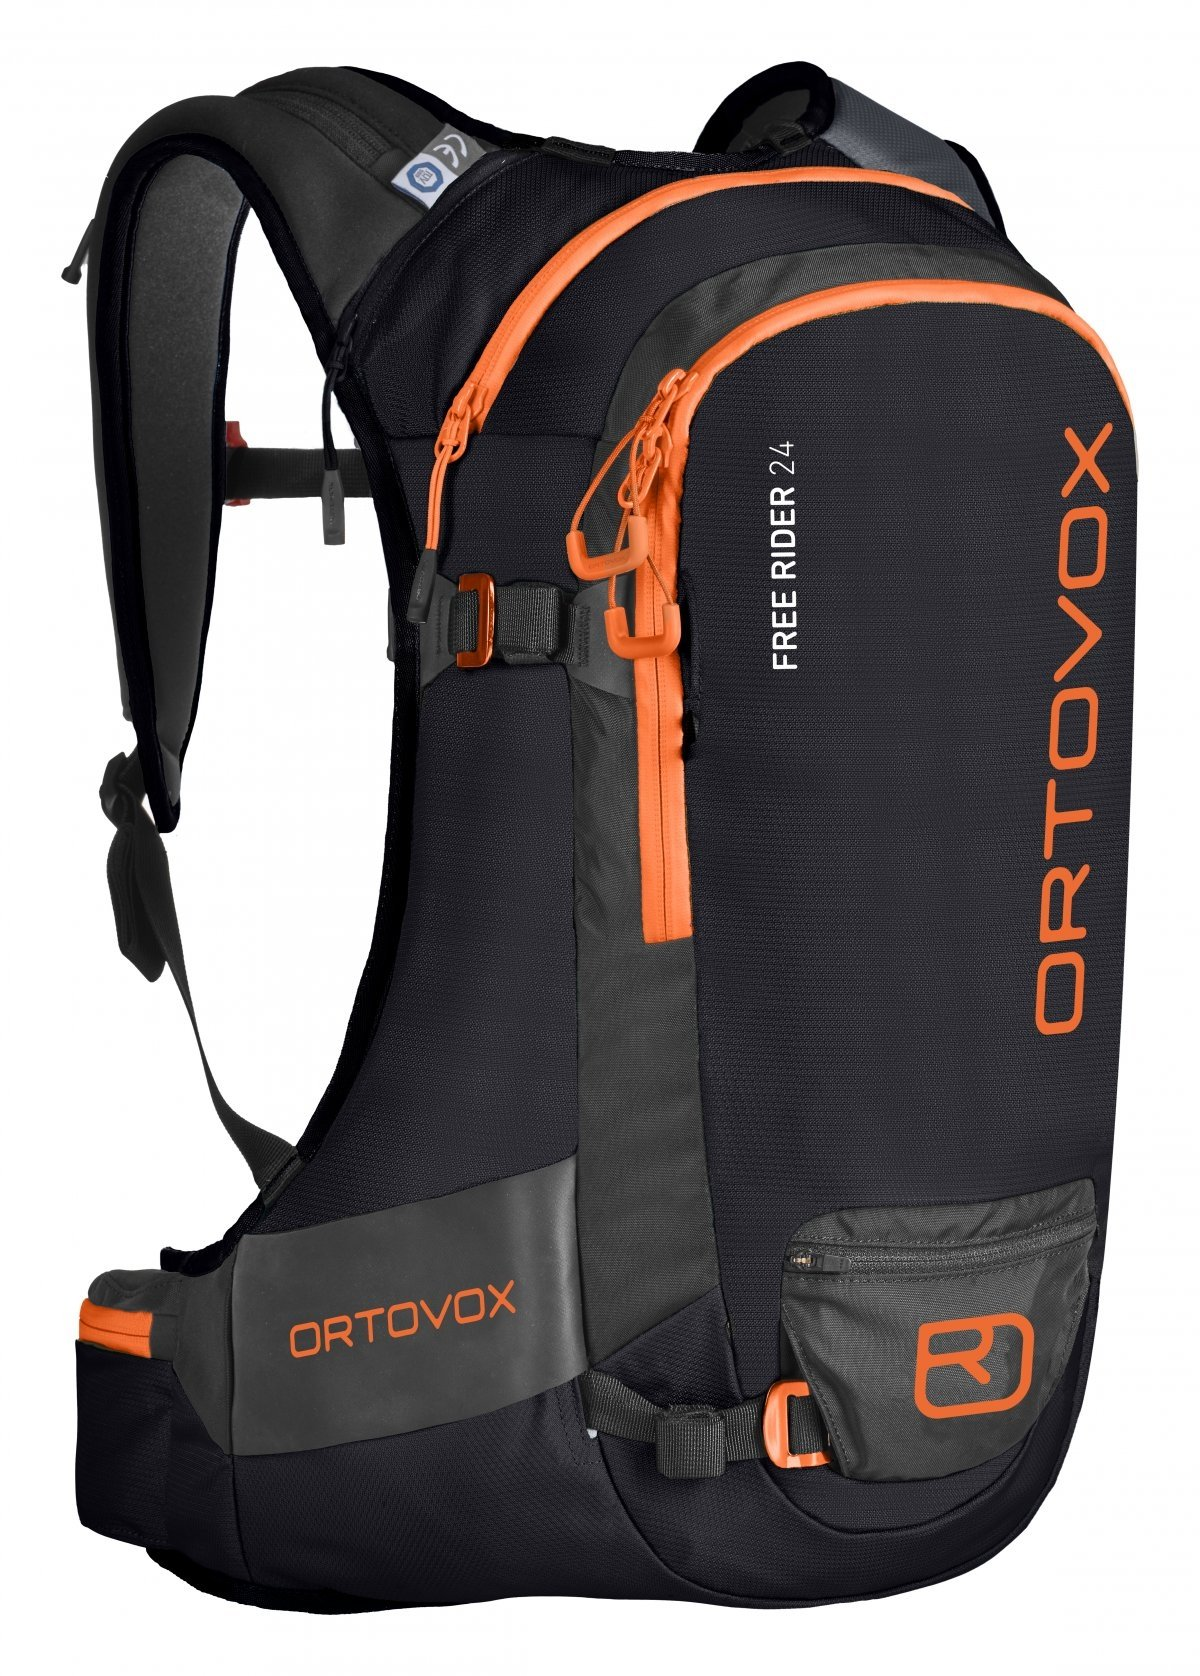 2018 ORTOVOX FREE RIDER 24 BLACK